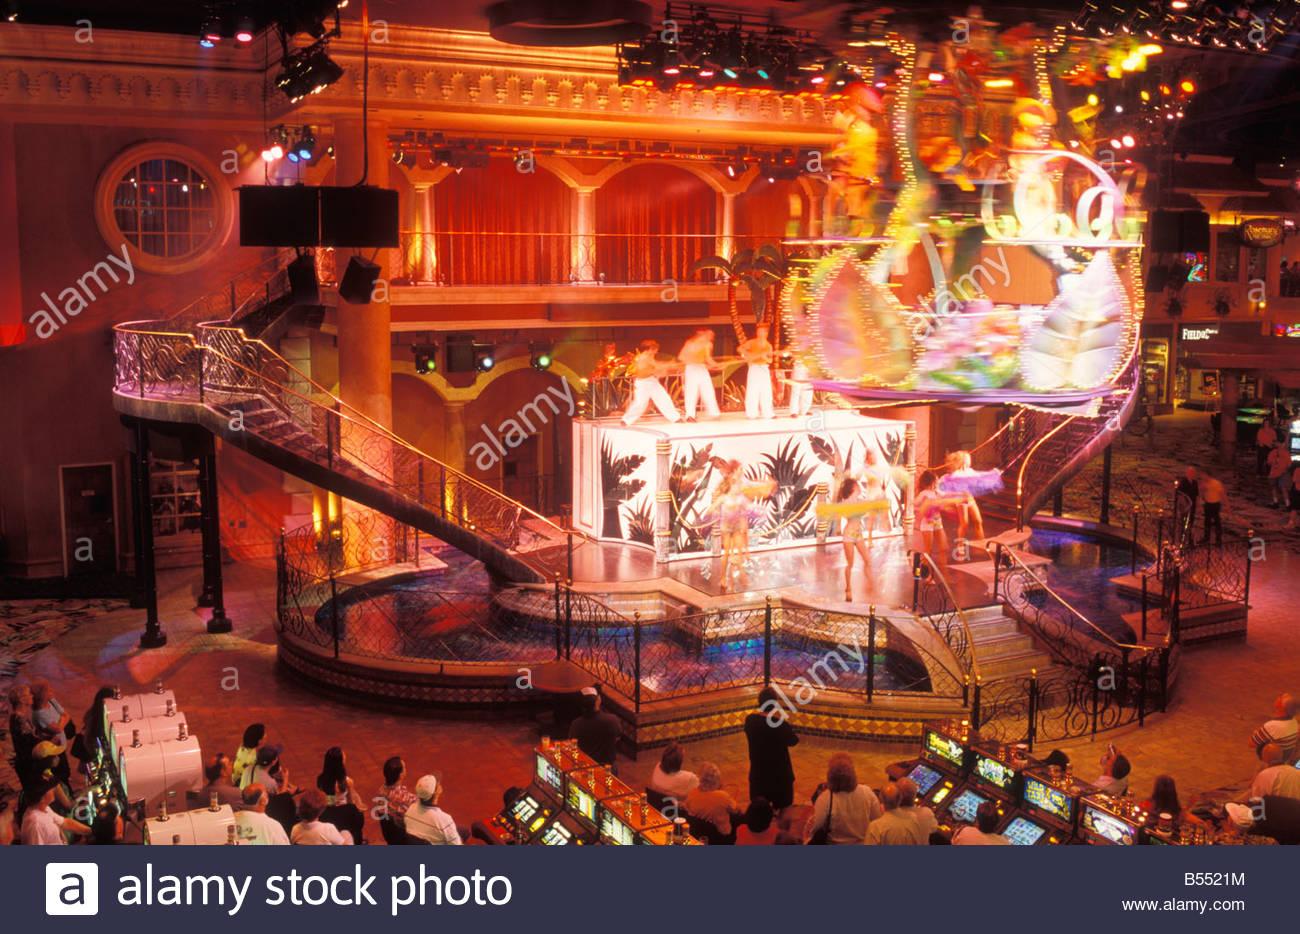 Las vegas nevada casino show ethical problems gambling